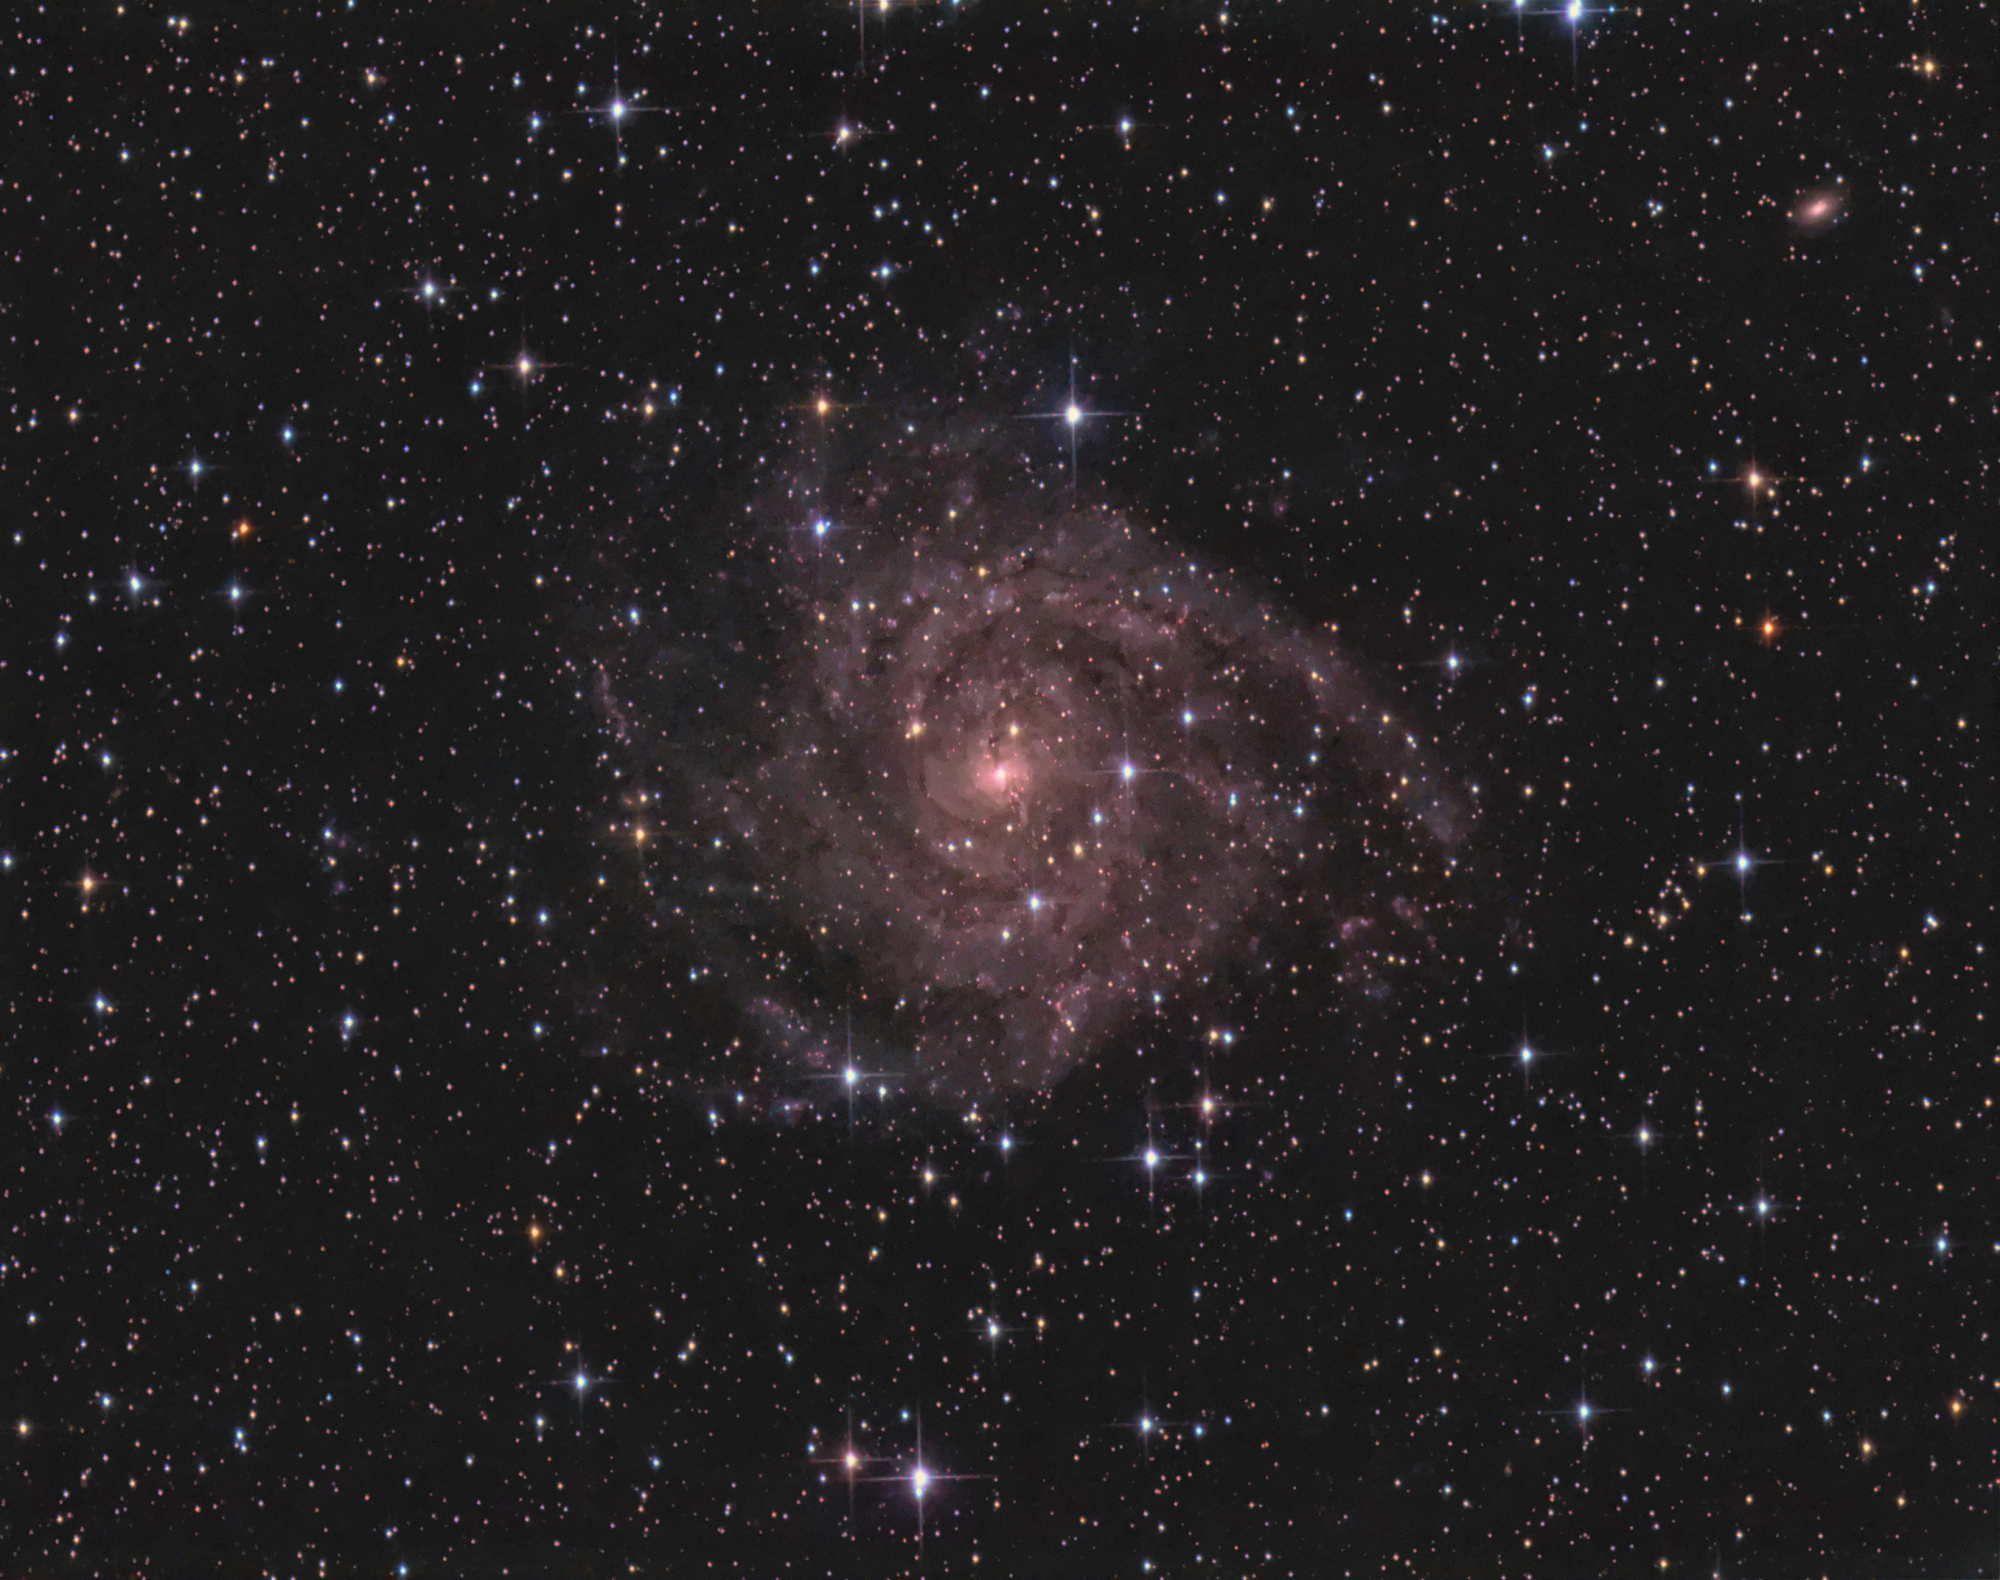 IC342-2019.thumb.jpg.9e8af52d4abb916f6e9ad4c45029b084.jpg